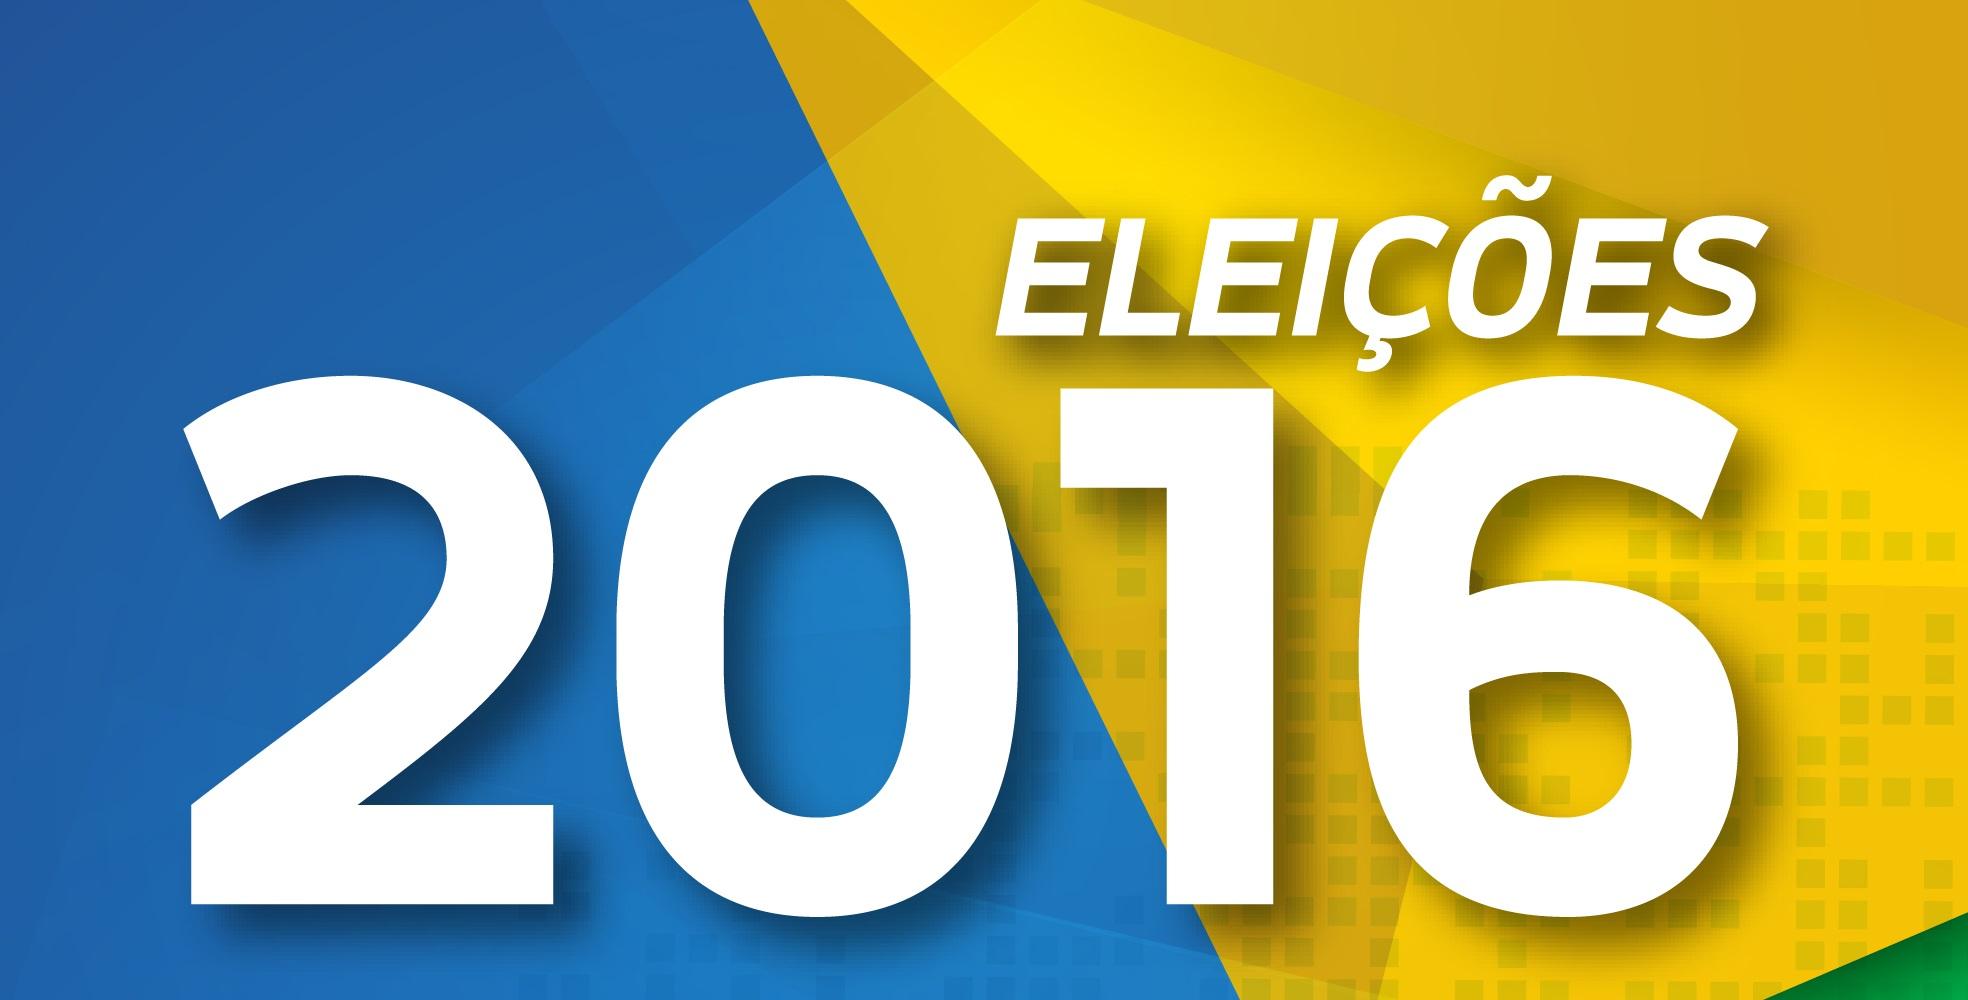 Conheça os candidatos a Vereador e a Prefeito de Alvorada do Oeste / RO